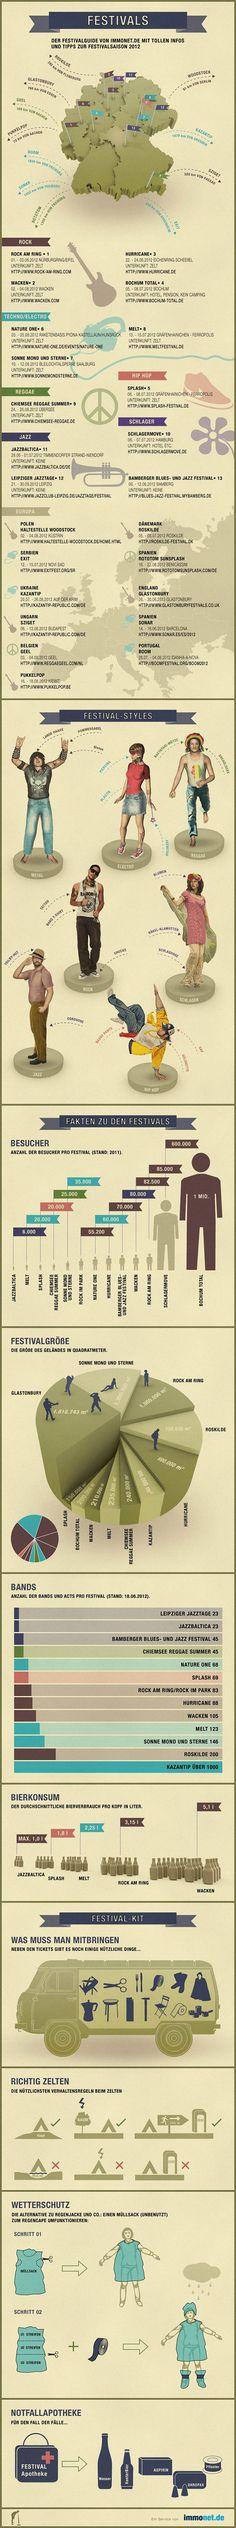 Festivalguide Infografik